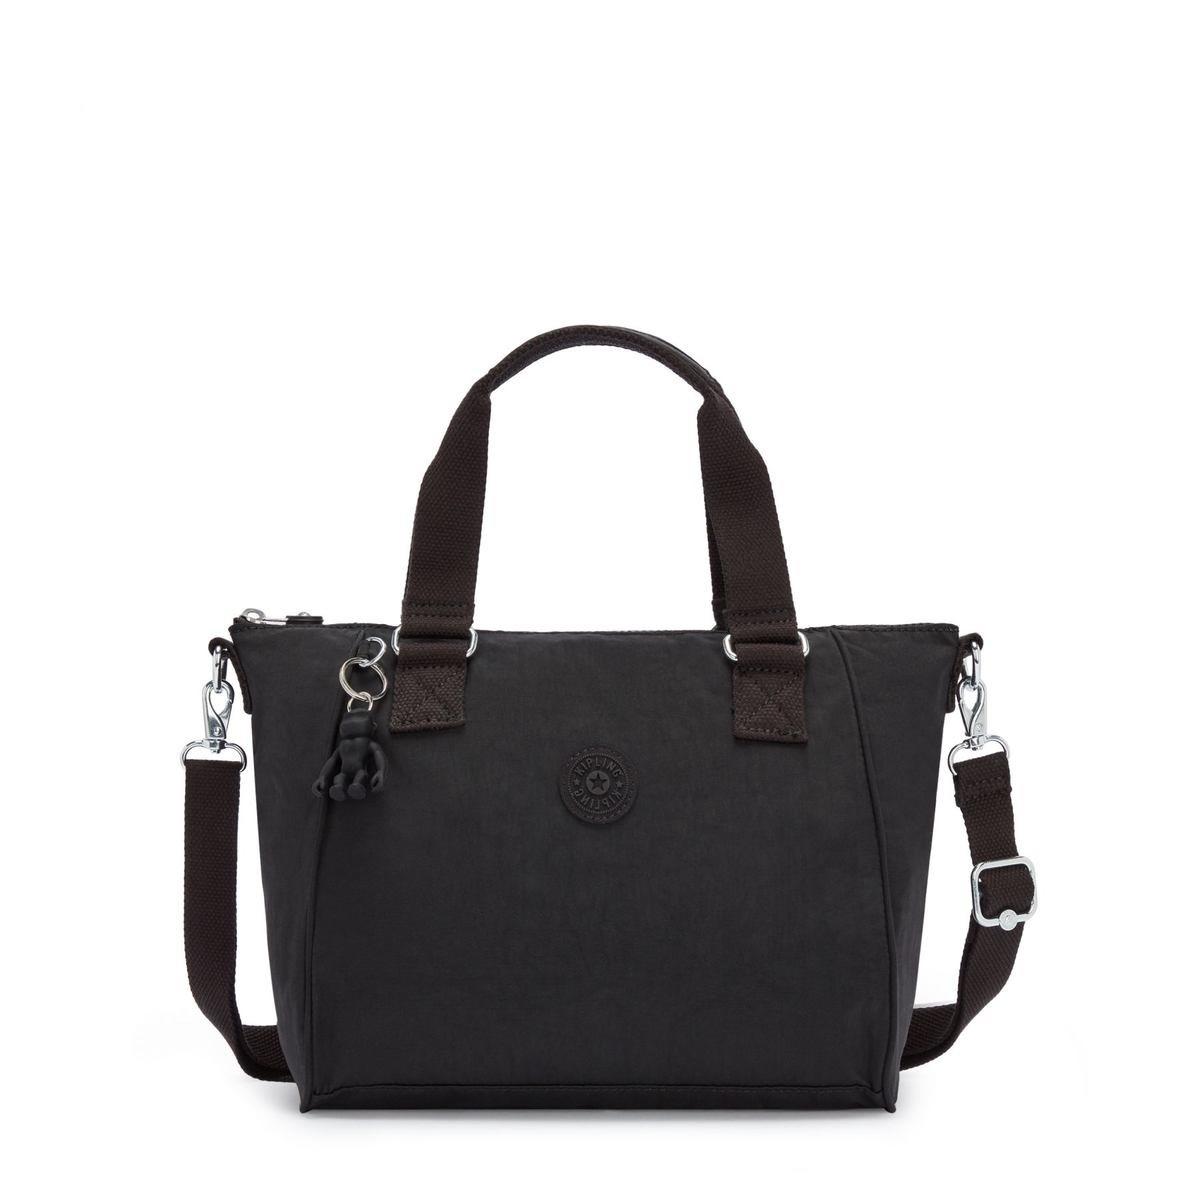 Kipling Τσάντα ώμου 27x24.5x14.5cm Dahlia Amie Black